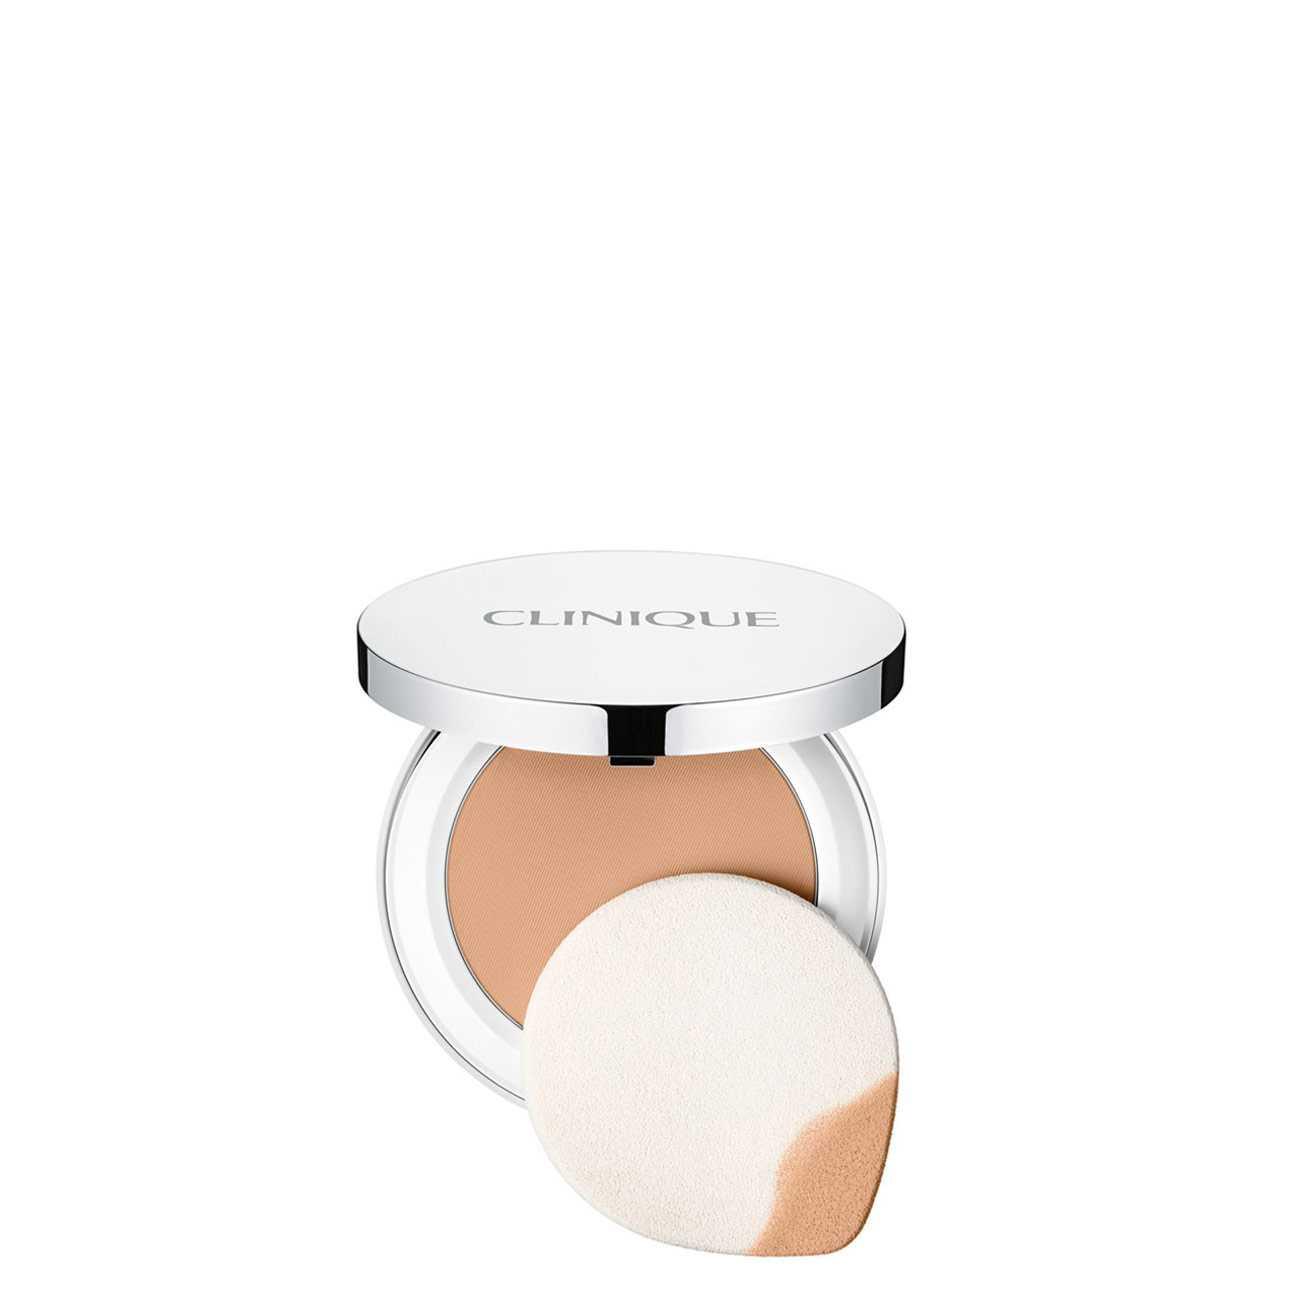 BEYOND PERFECTING POWDER FOUNDATION 14 ML Cream Chamois 7 imagine produs